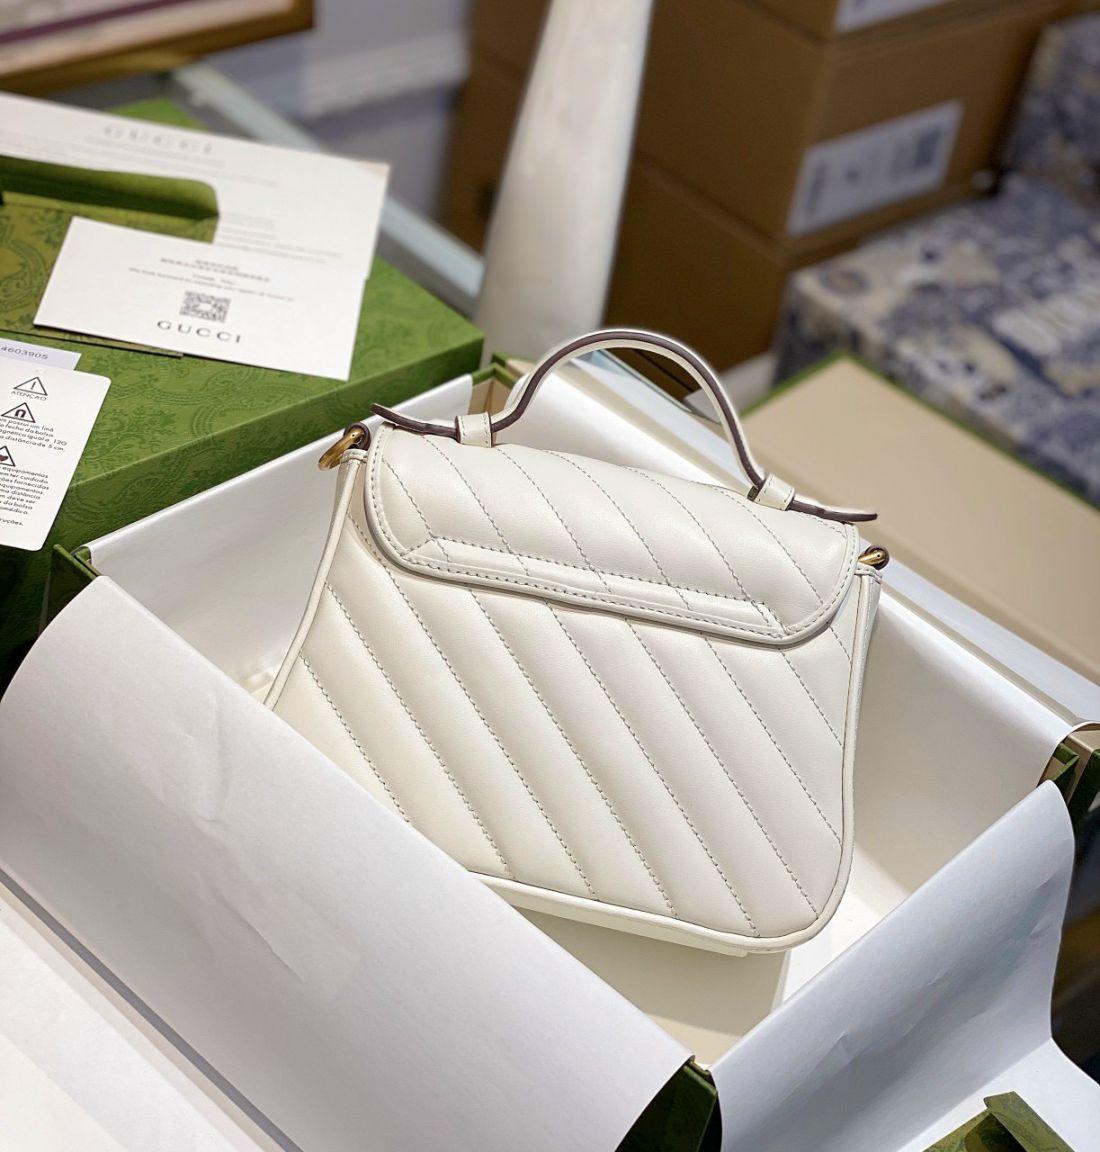 Gucci Marmont Top Handle Bag – Trắng